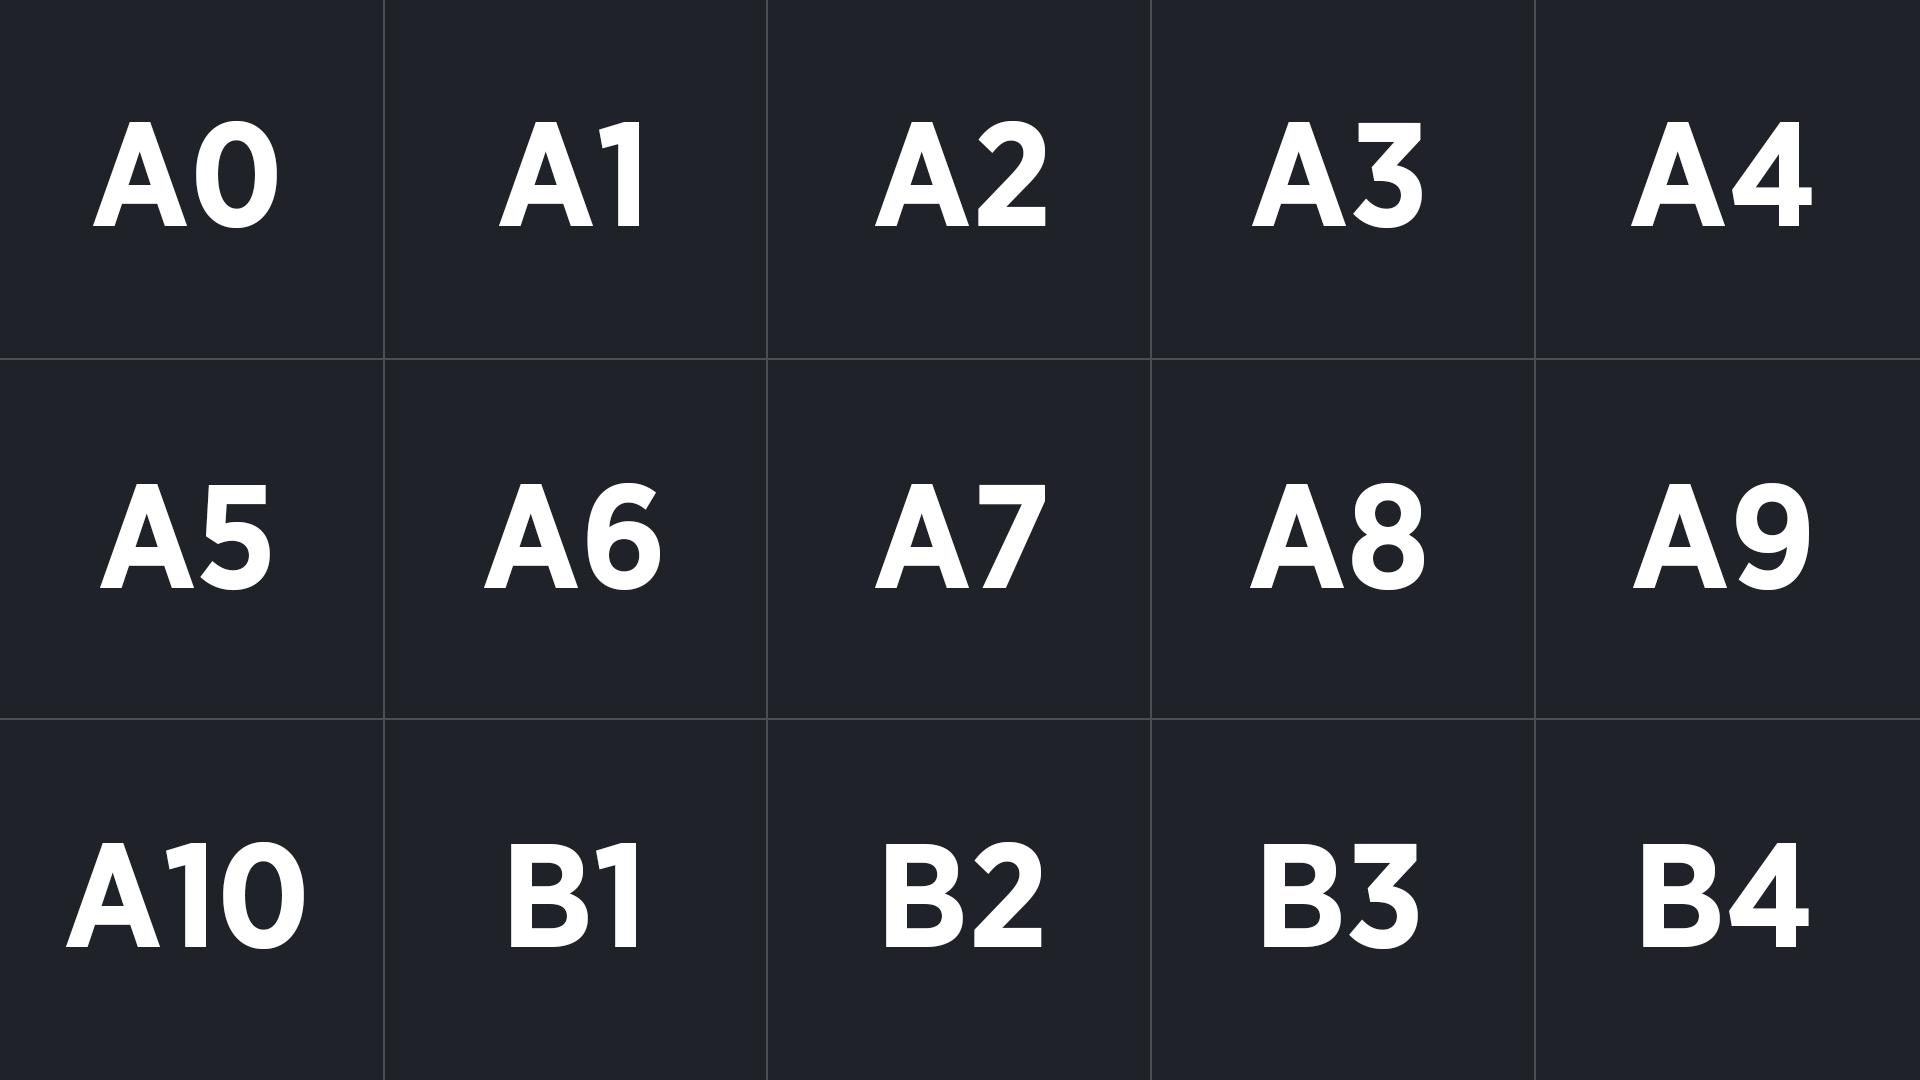 International Paper Sizes A0, A1, A2, A3, A4, A5, A6, A7, A8, A9, A10